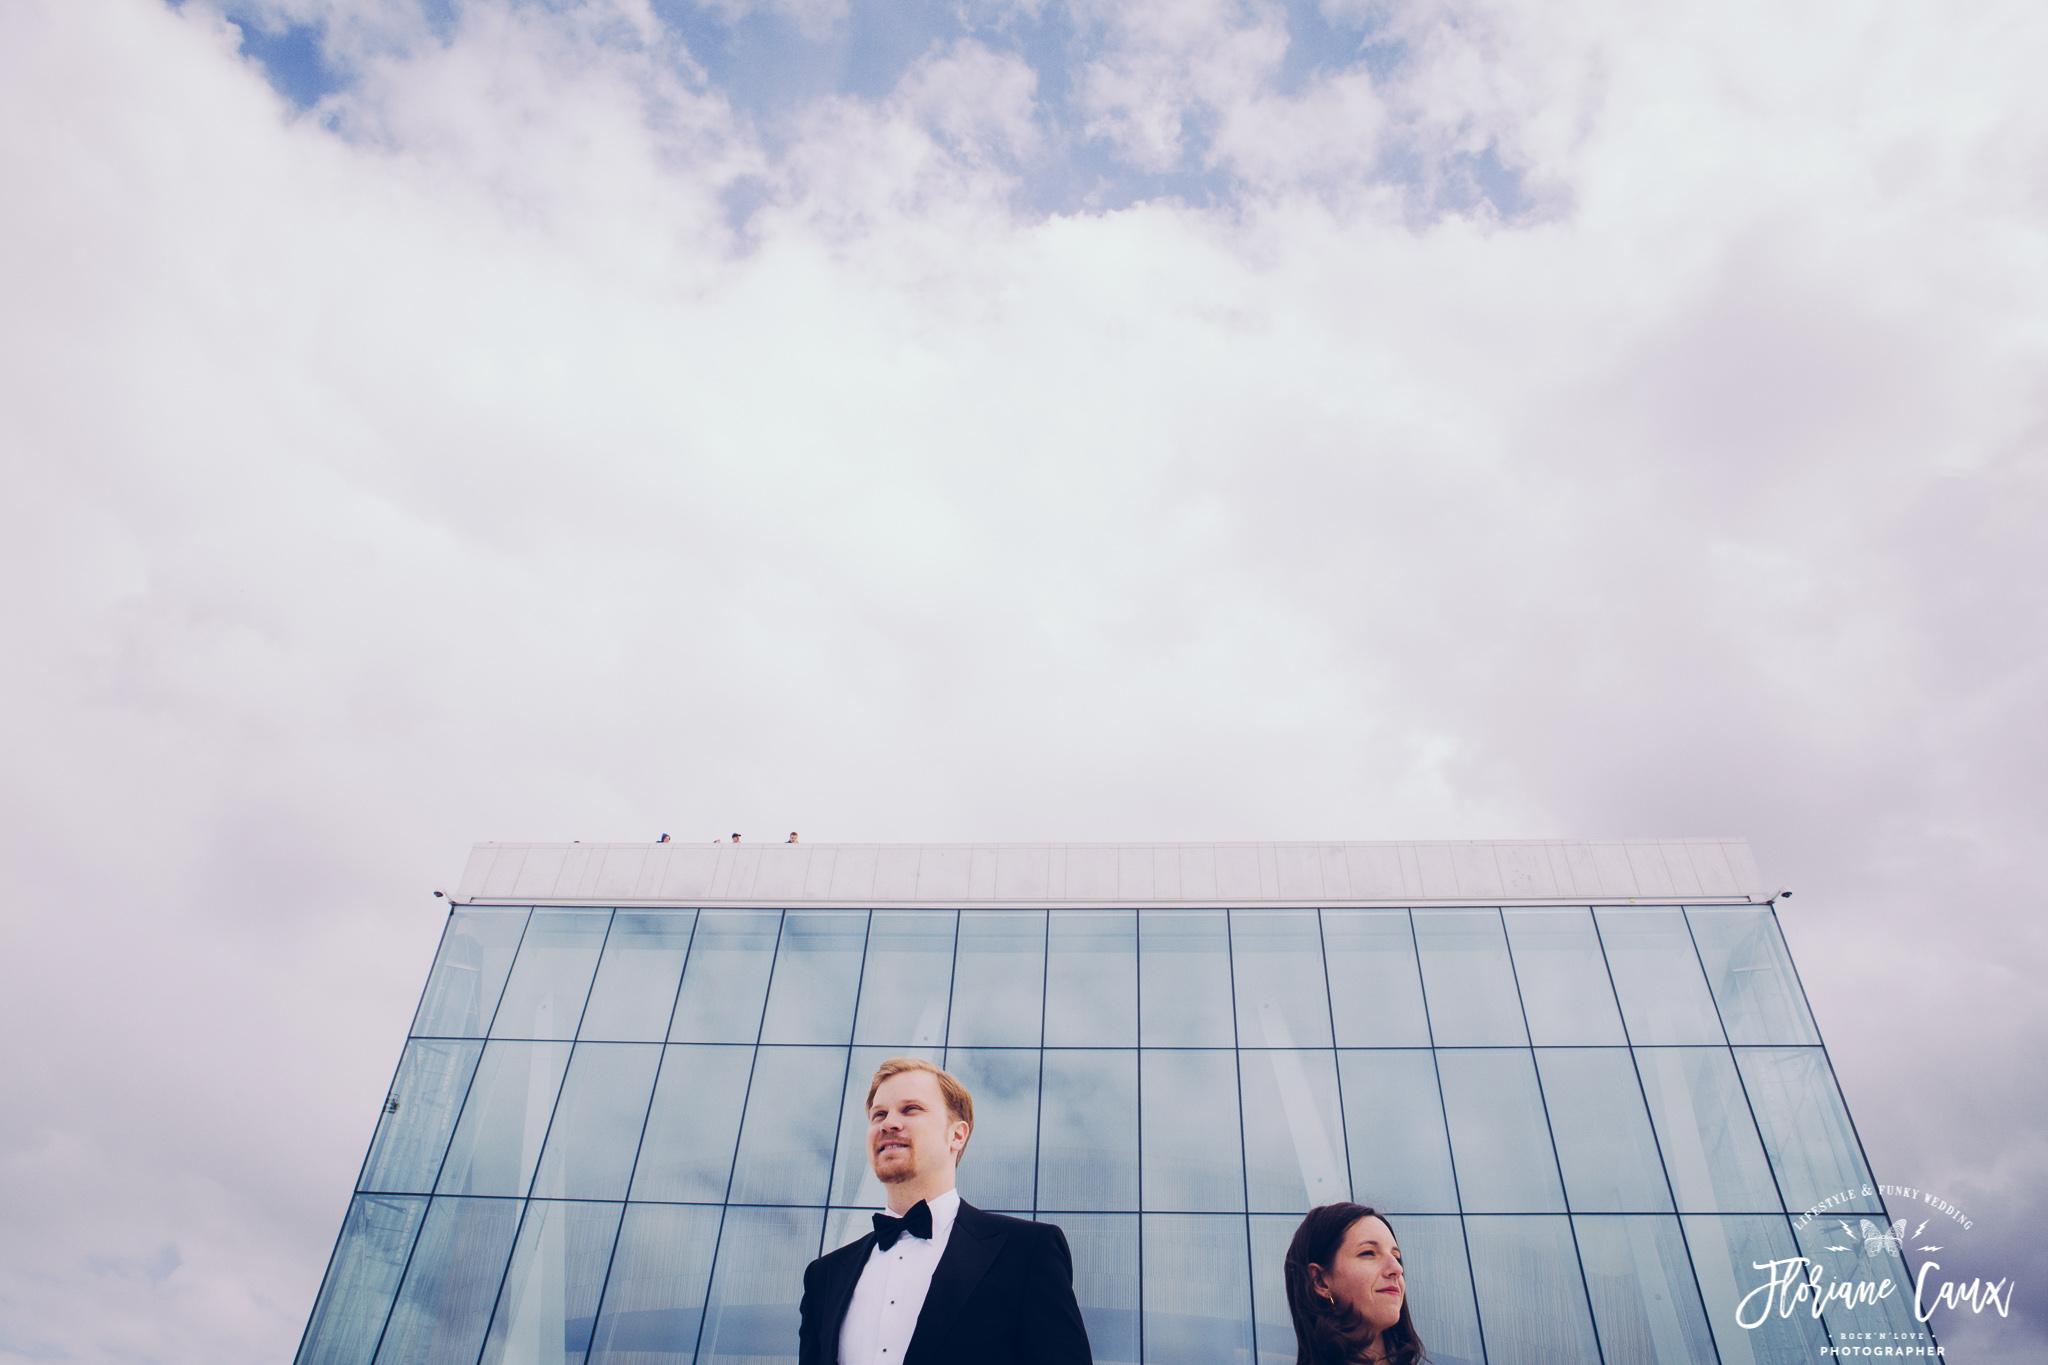 destination-wedding-photographer-oslo-norway-floriane-caux-62